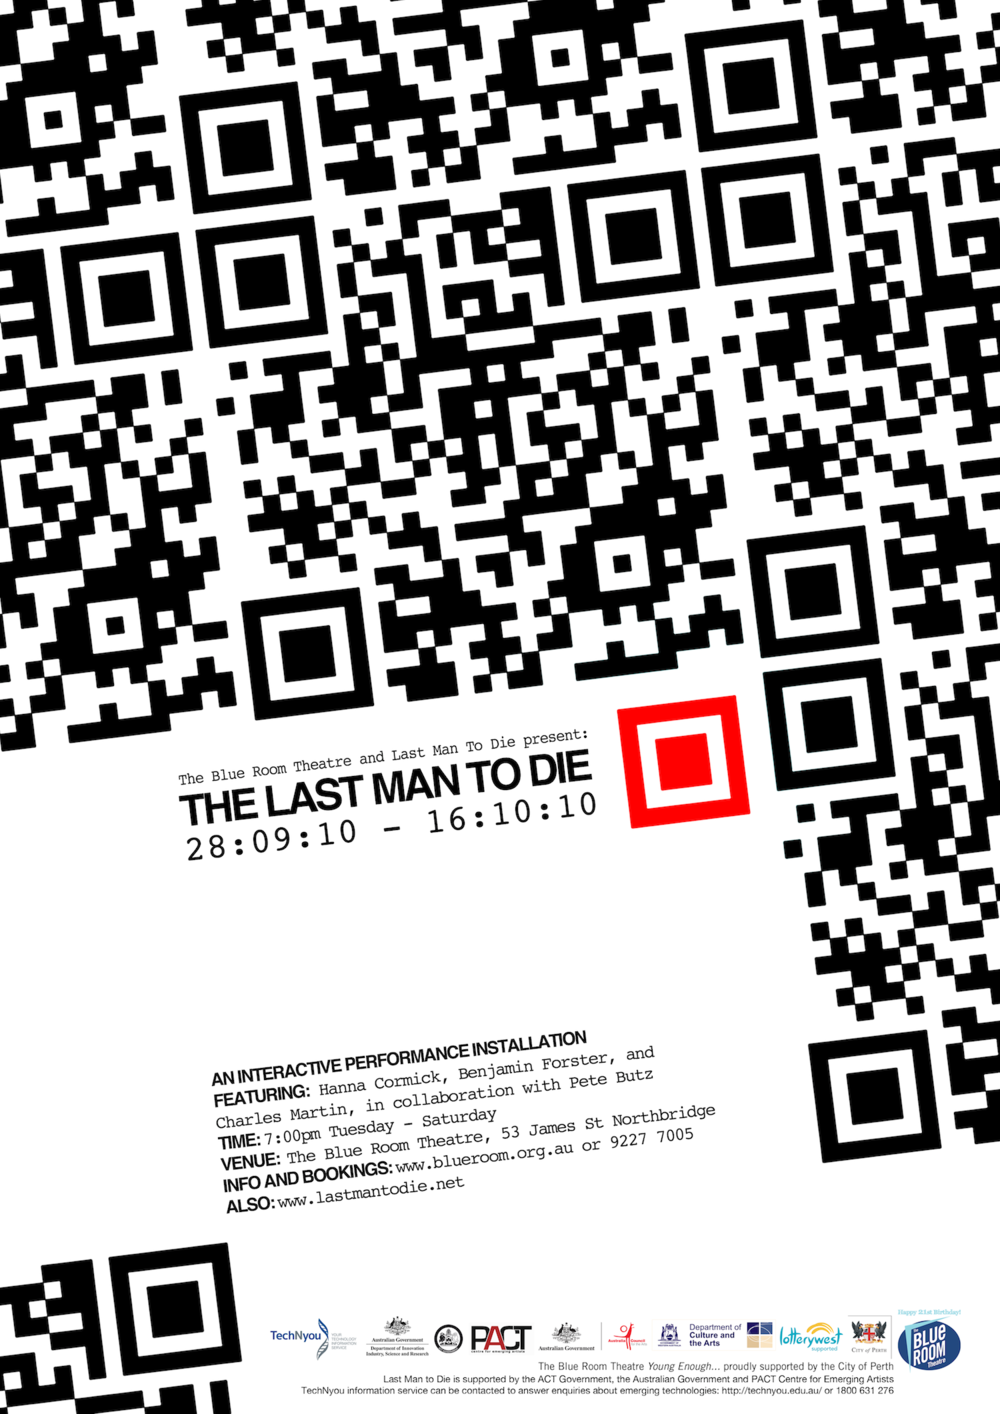 LMTD Blue Room Poster